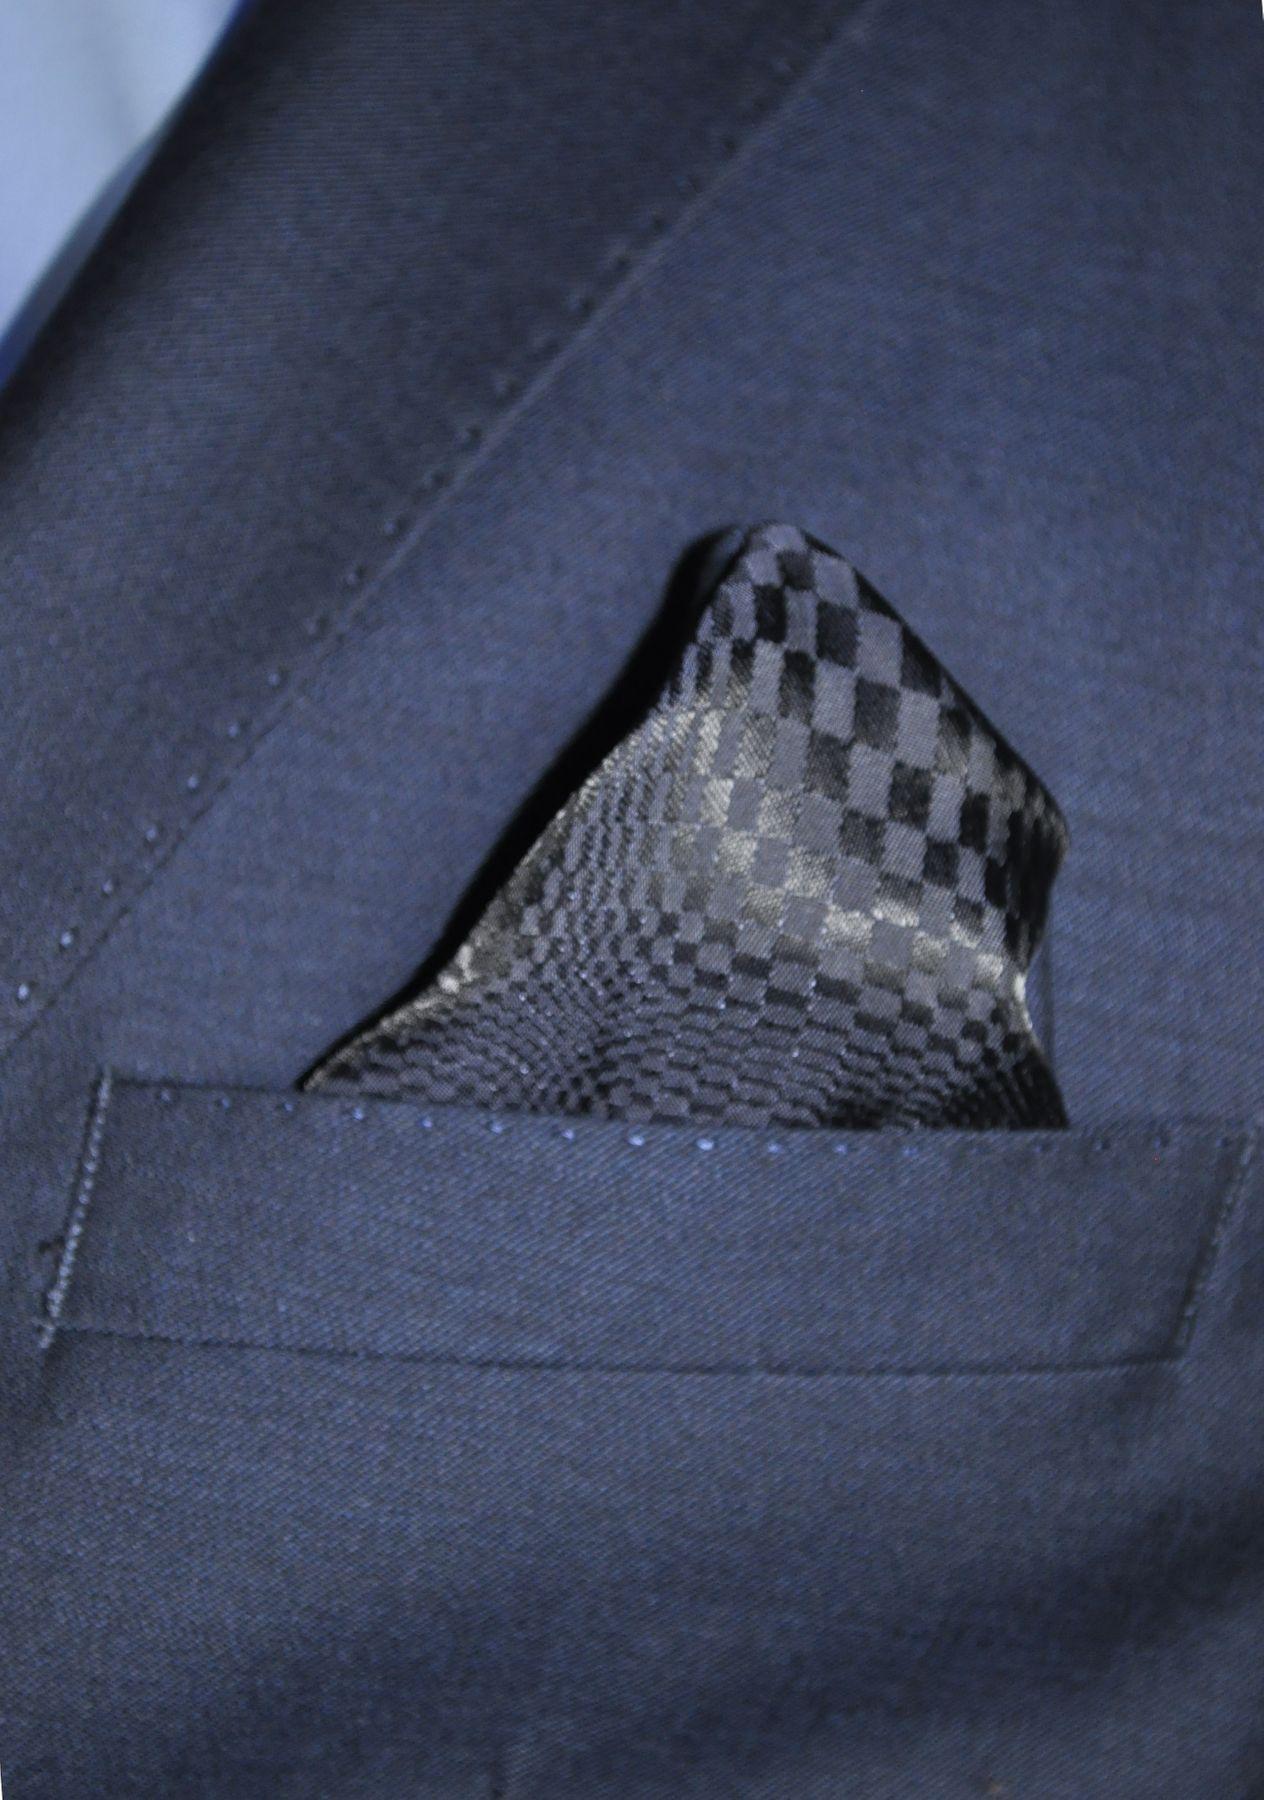 Abiball Anzug - Slim Fit - Herren Anzug in Deep Ocean Blue, Luigi B/Elio (Art.: 835 1510) – Bild 5